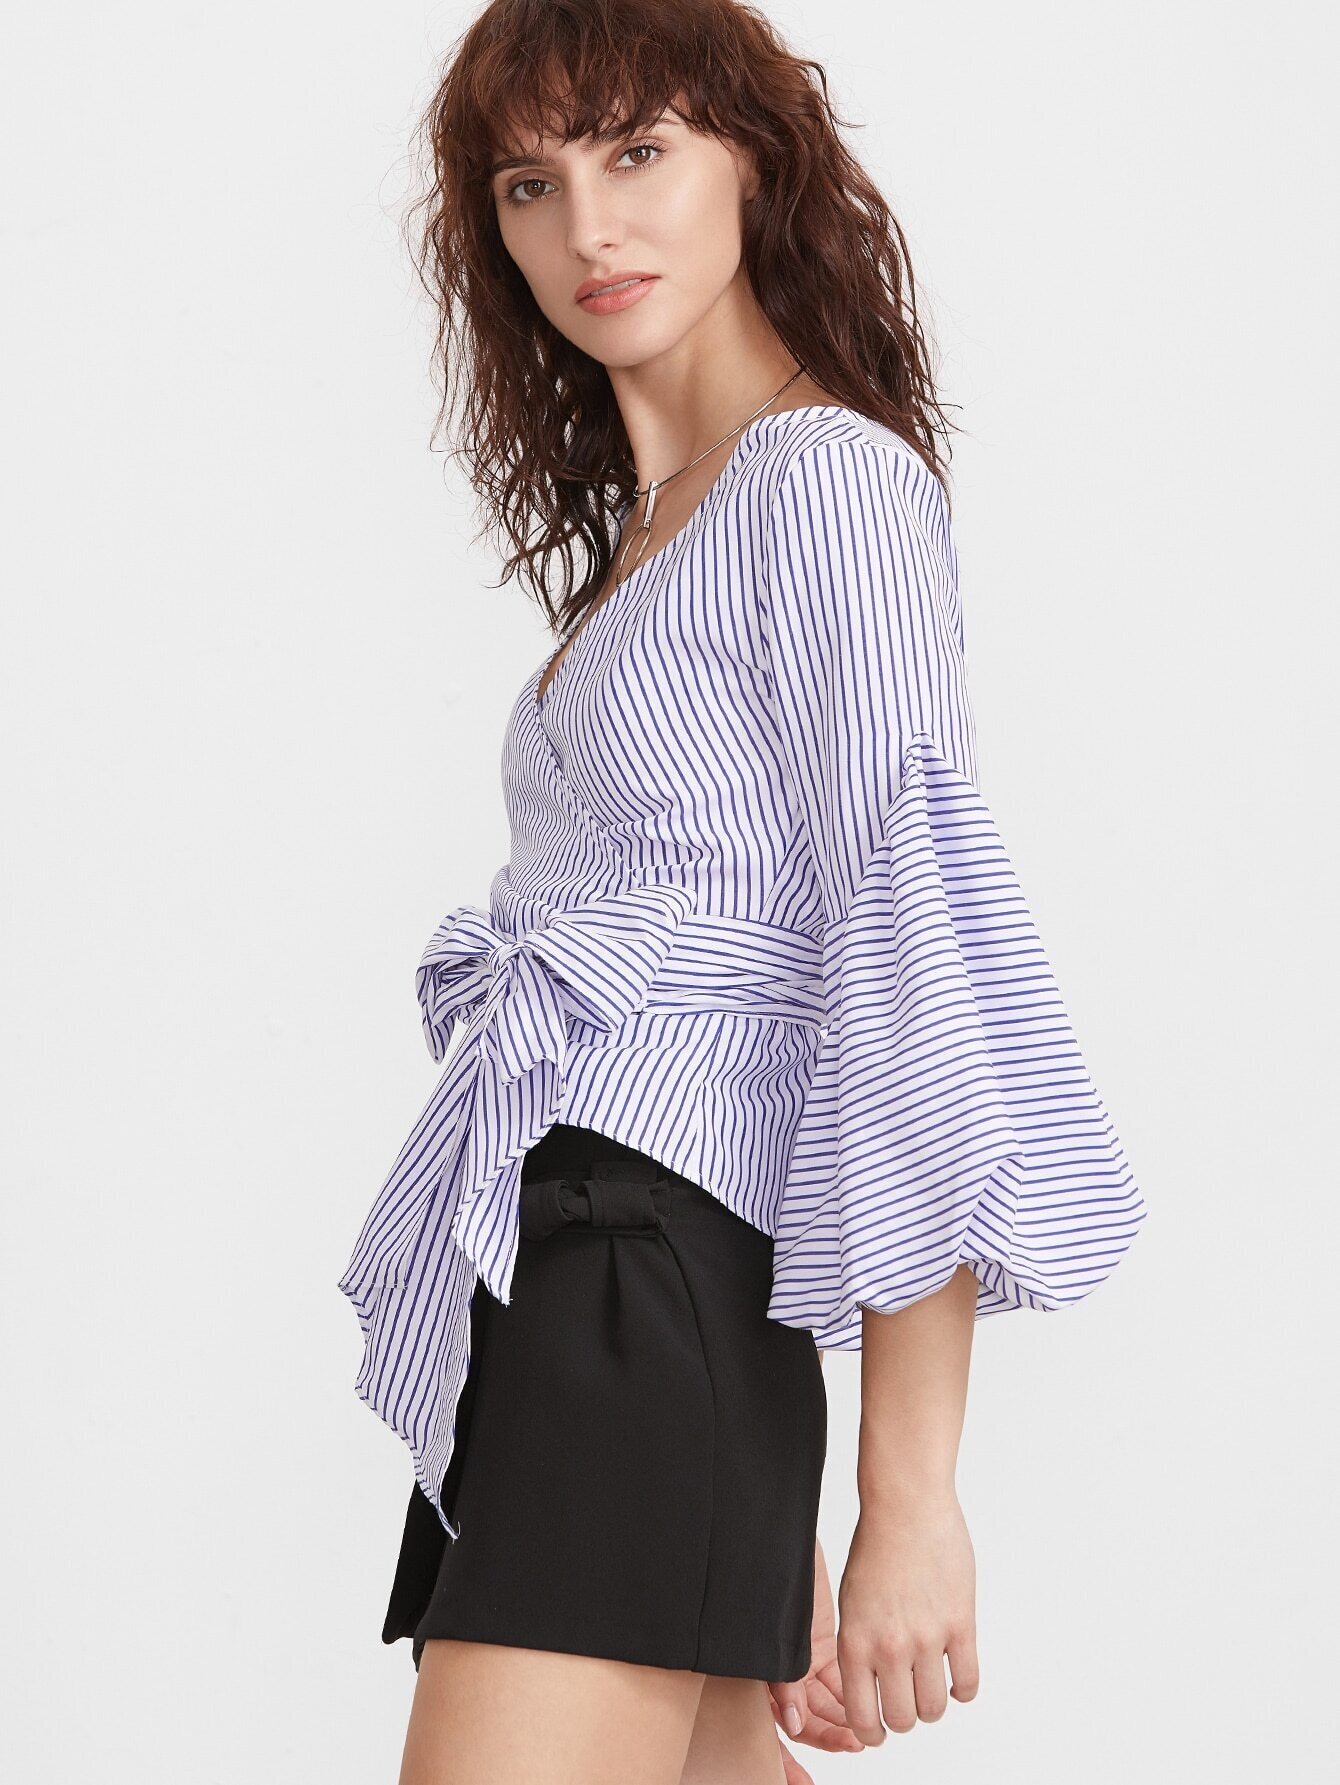 blouse161010707_2